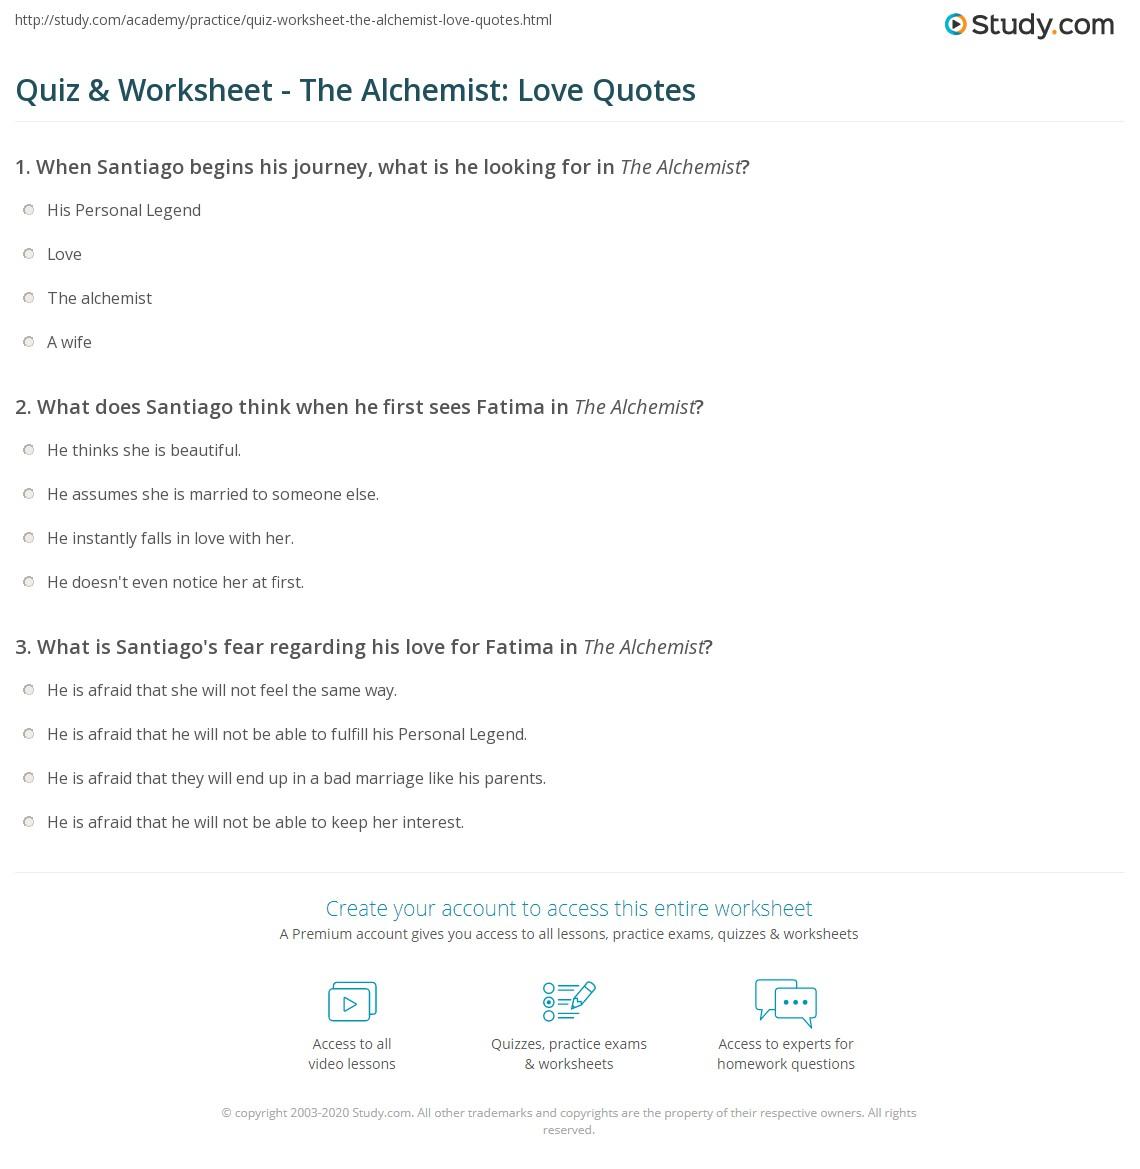 Print The Alchemist Love Quotes Worksheet